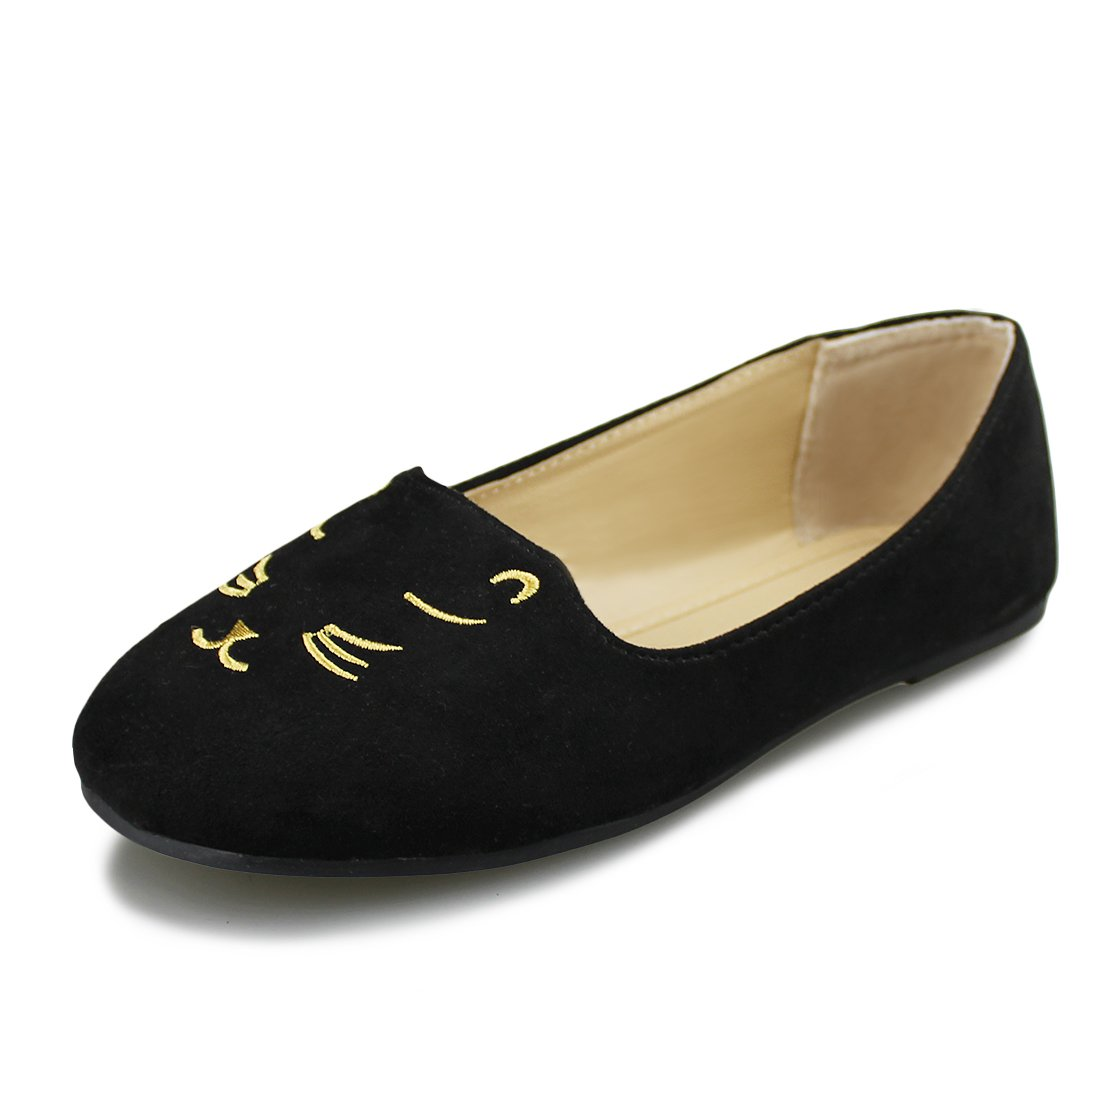 Hawkwell Girls Mary Jane Ballerina Flat Shoes(Toddler/Little Kid/Big Kid)